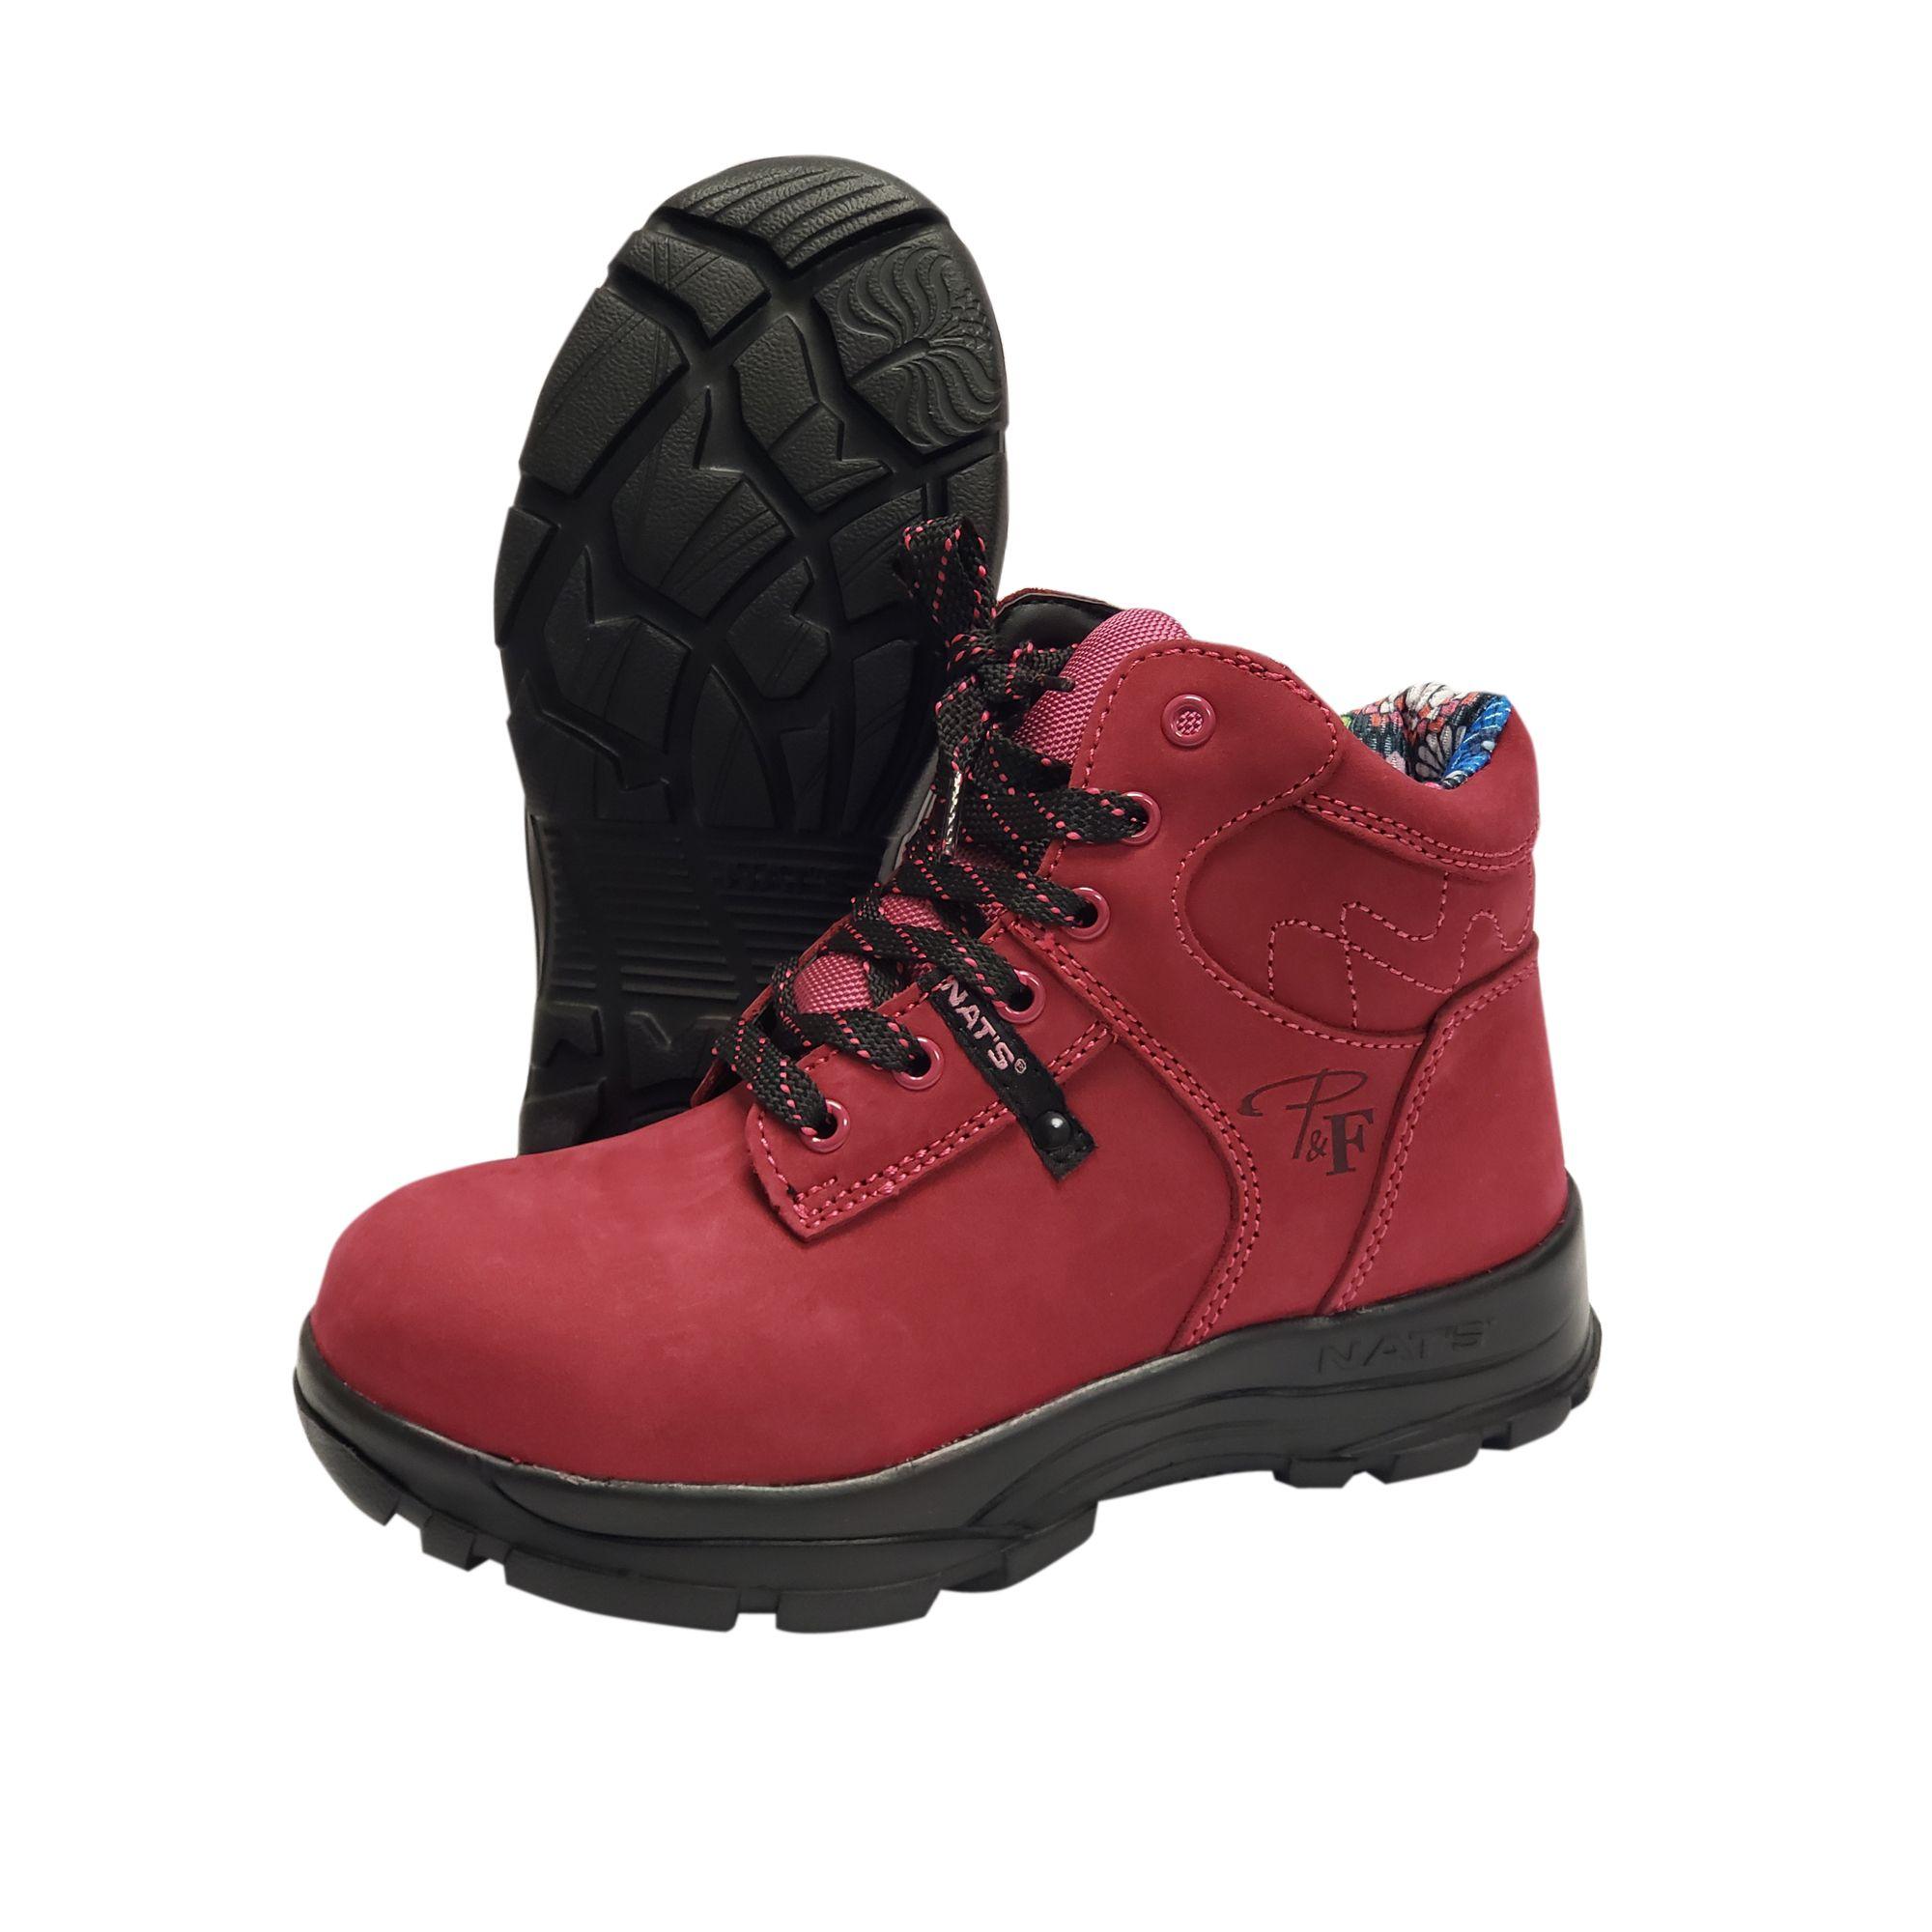 6 Ultra Light Work Boot With Steel Toe Raspberry Light Work Boots Boots Work Boots